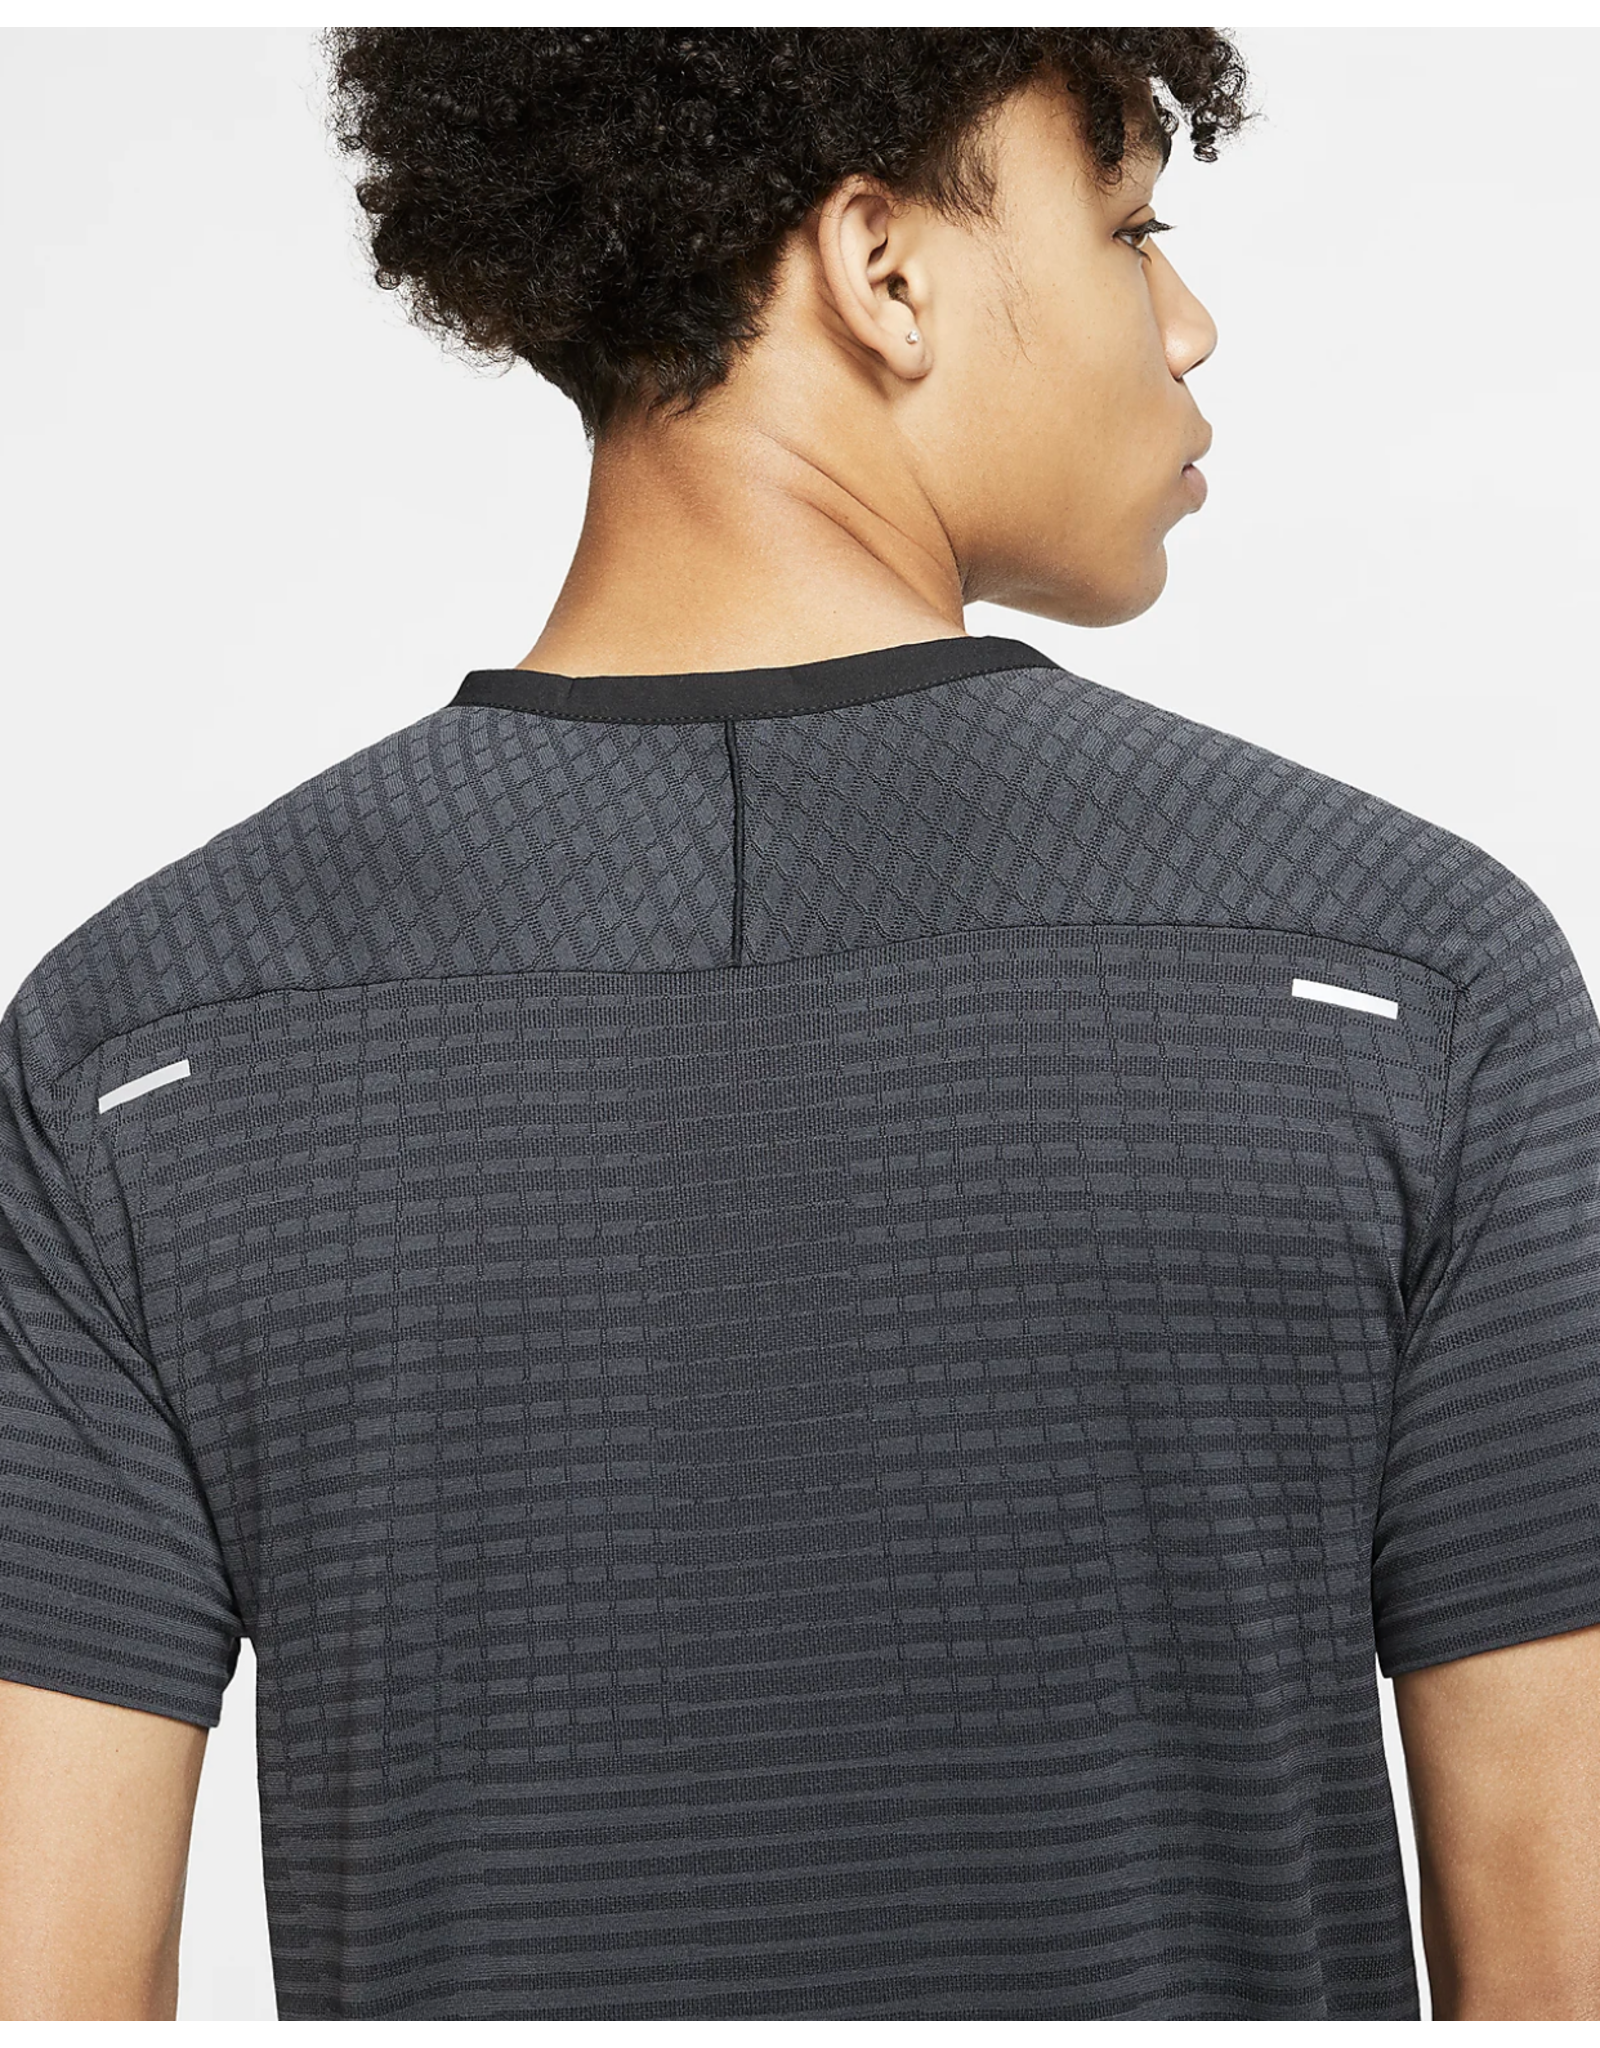 Nike Nike Technit Ultra Running Shirt